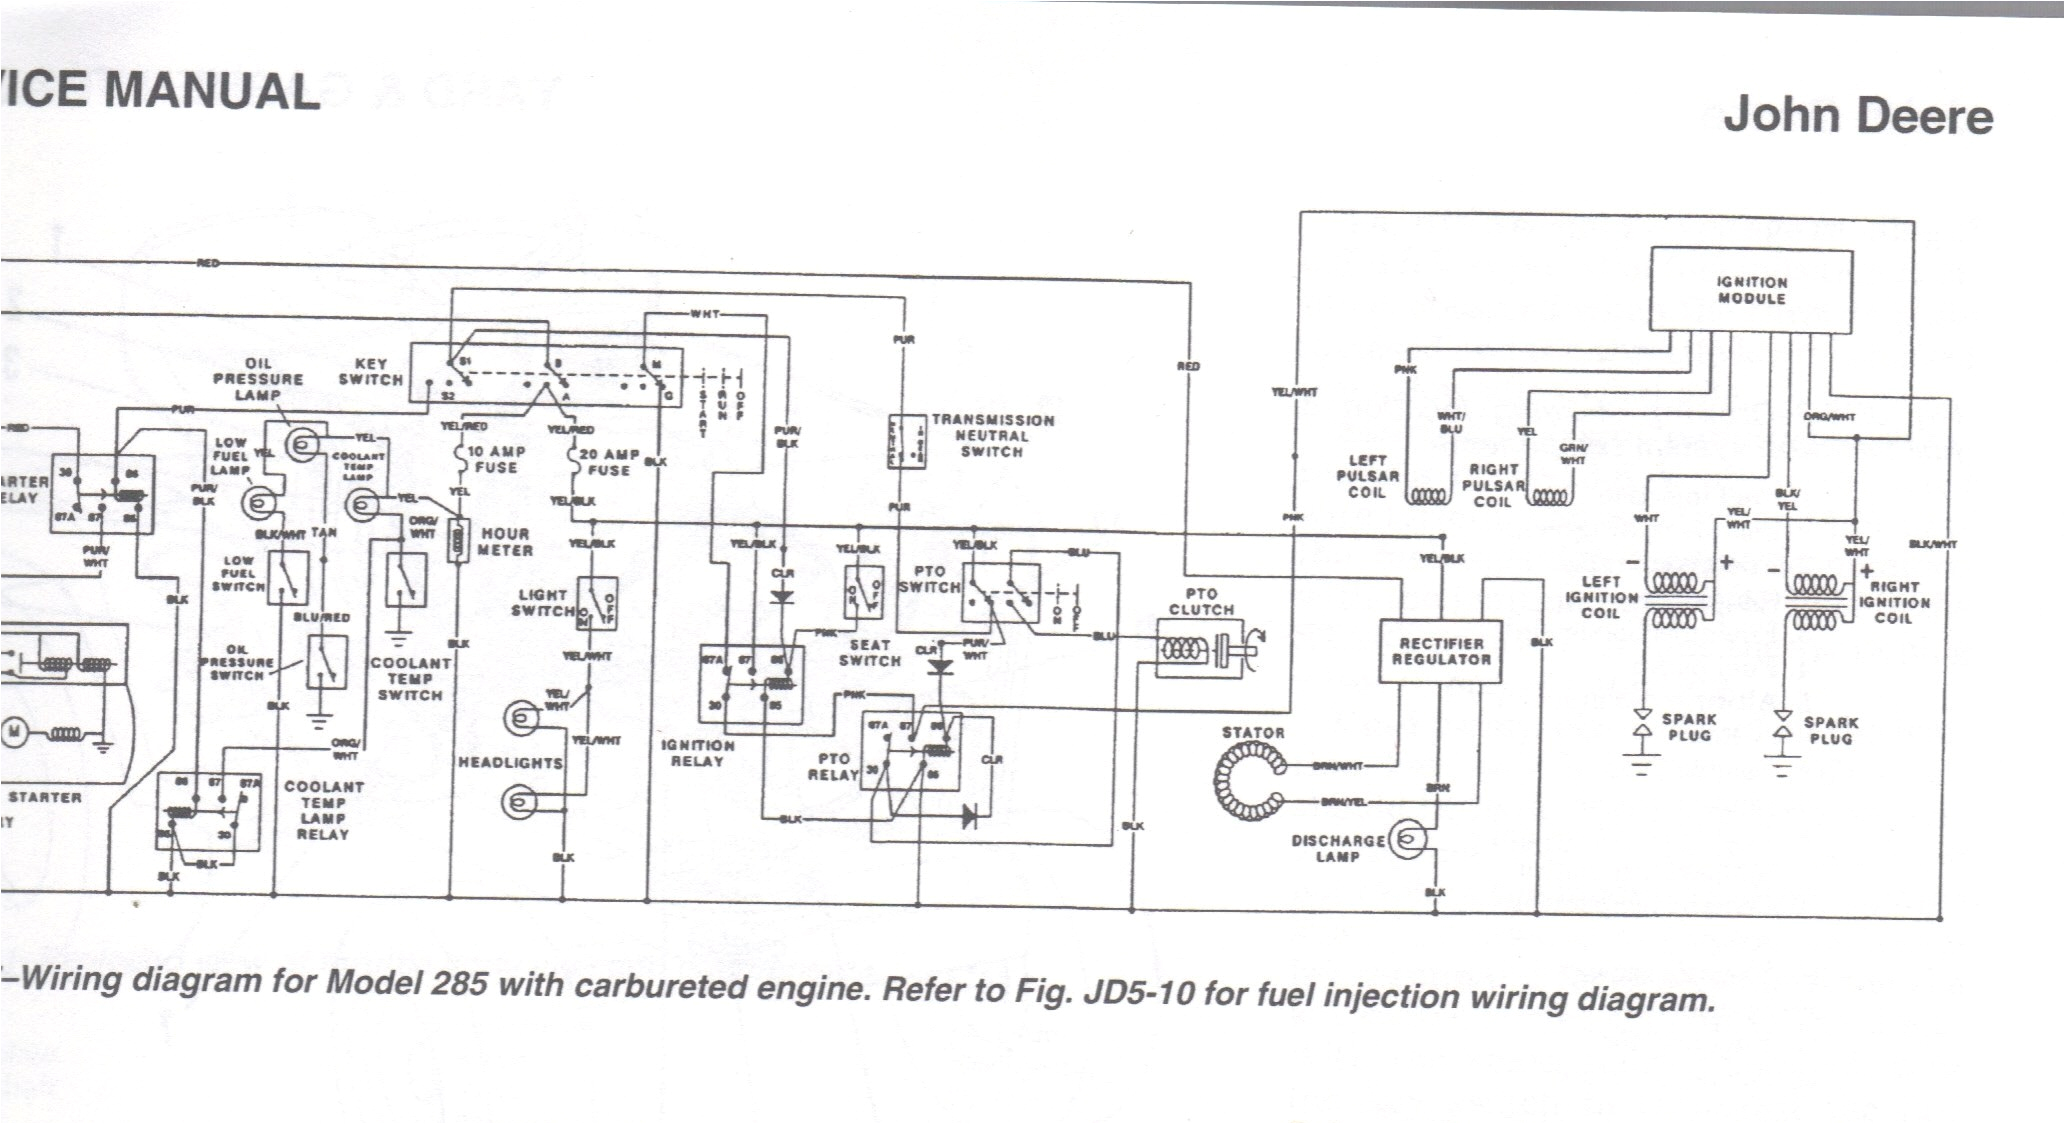 Audi A2 Wiring Diagram Audi A2 Wiring Diagram Pdf Wiring Diagram Expert